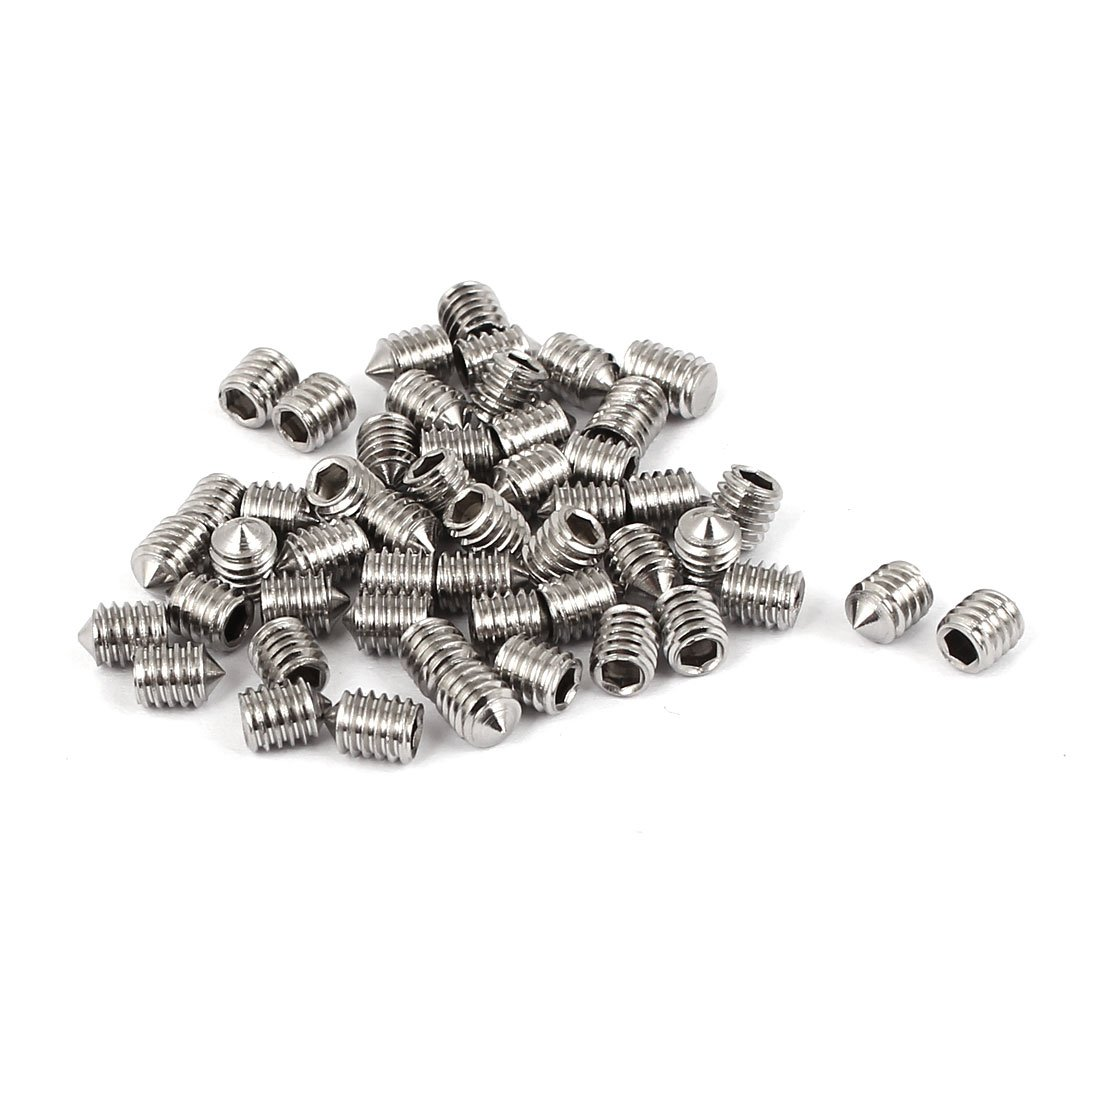 sourcingmap® M4 x 5 mm de acero inoxidable 304 de punta cónica hueca hexagonal de Tornillo sin cabeza 50 pcs a16012900ux0668